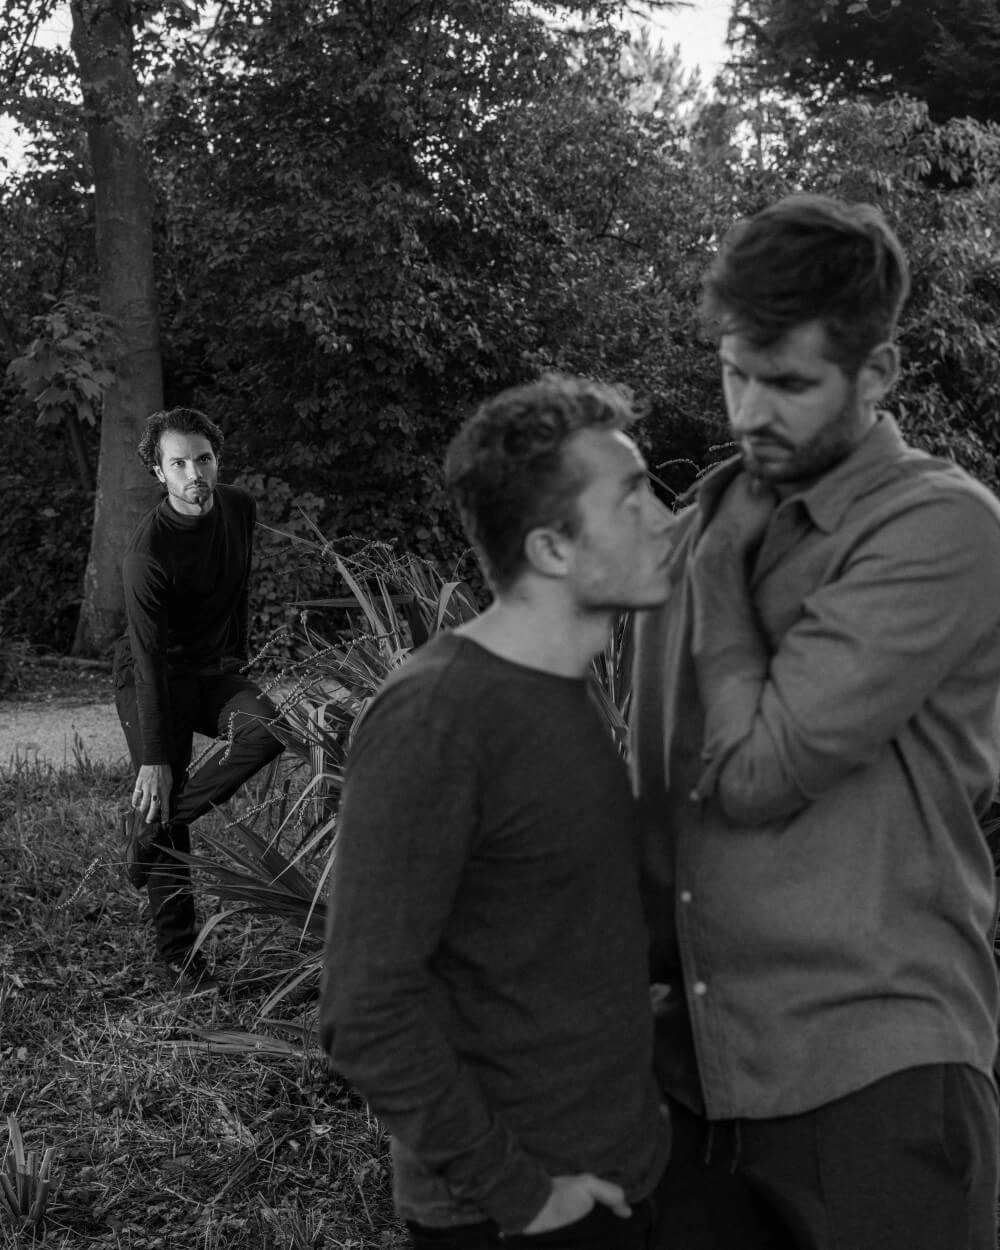 Nick Bruckman - Bleeding Love - Foto Dustin Thierry